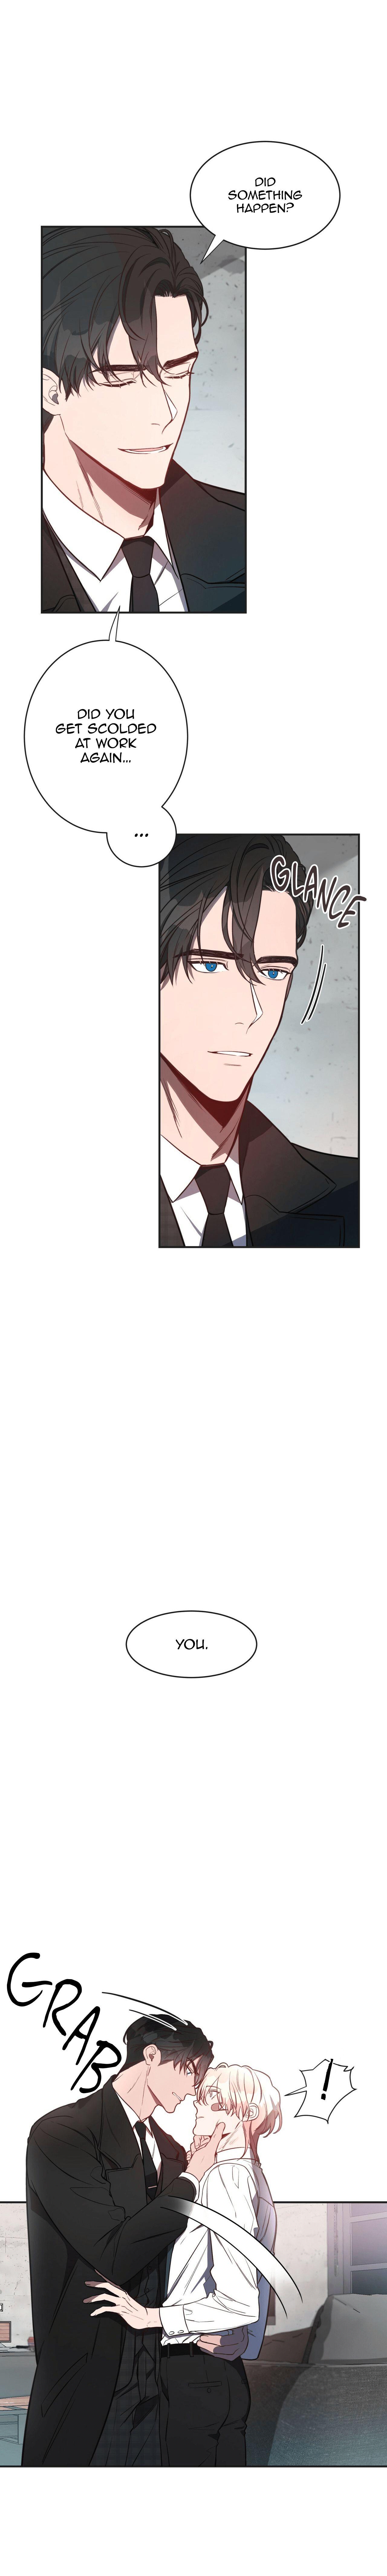 Read Big Apple Manga English [New Chapters] Online Free